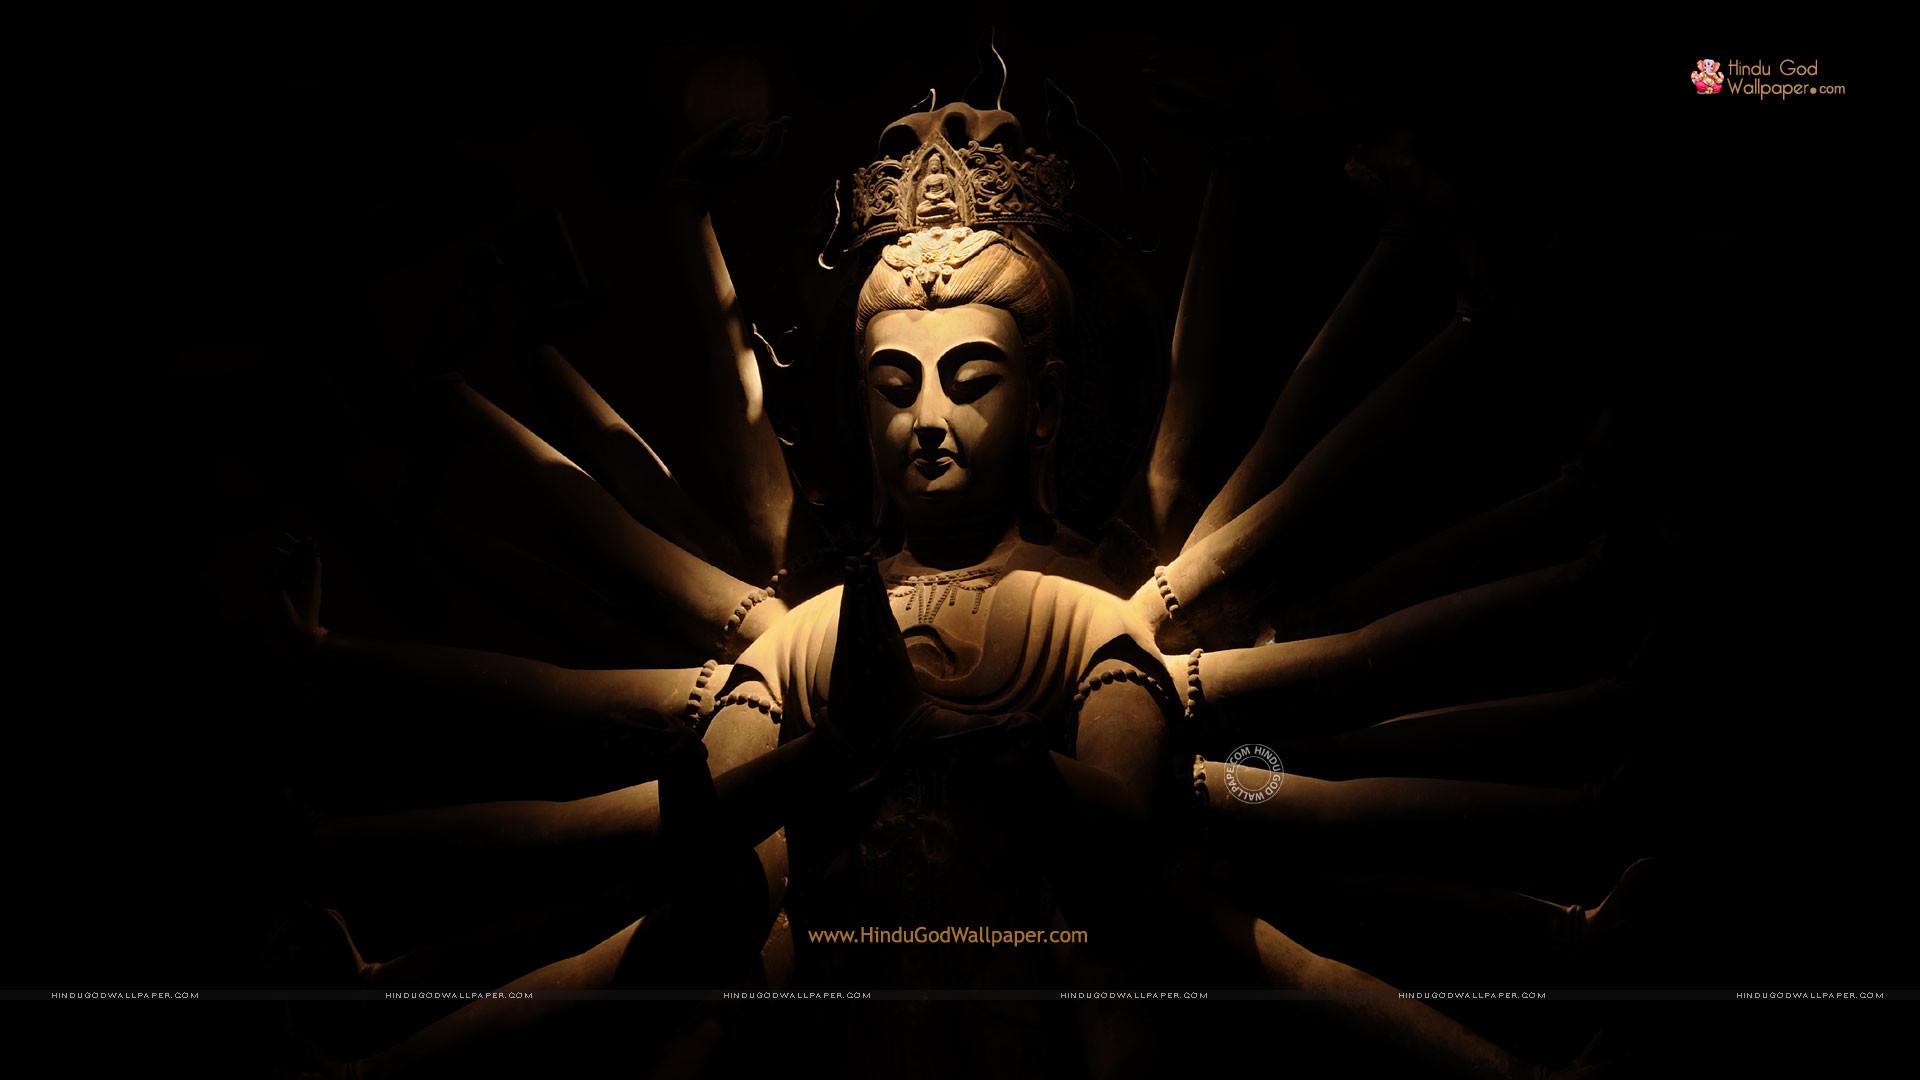 Sai Baba Wallpaper For Iphone 6 Hd Hindu God Desktop Wallpaper 44 Images